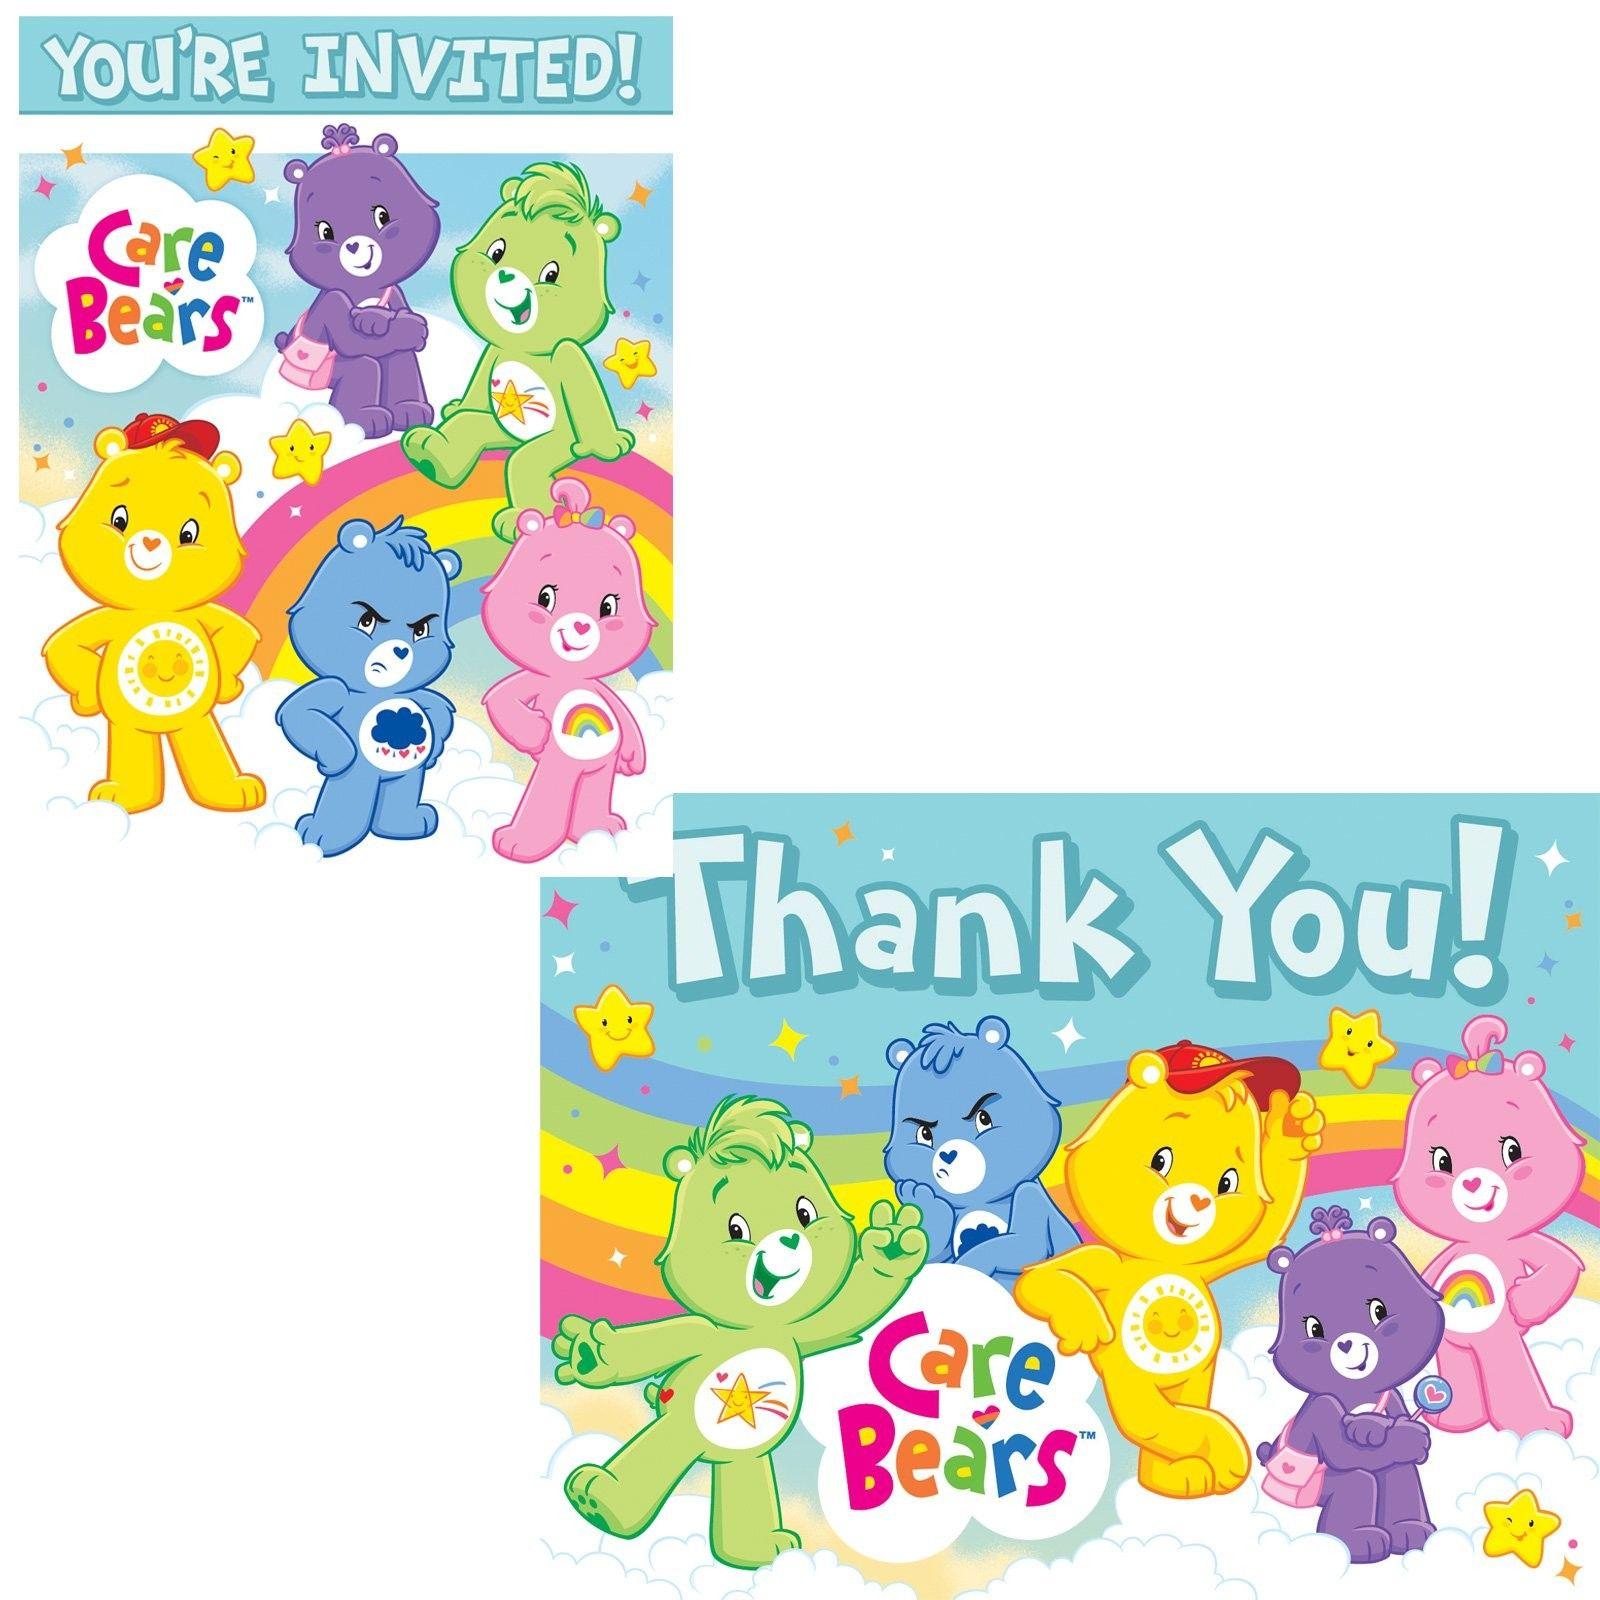 Care bears happy days invitationsthank you postcards includes 8 care bears happy days invitationsthank you postcards party accessory monicamarmolfo Choice Image